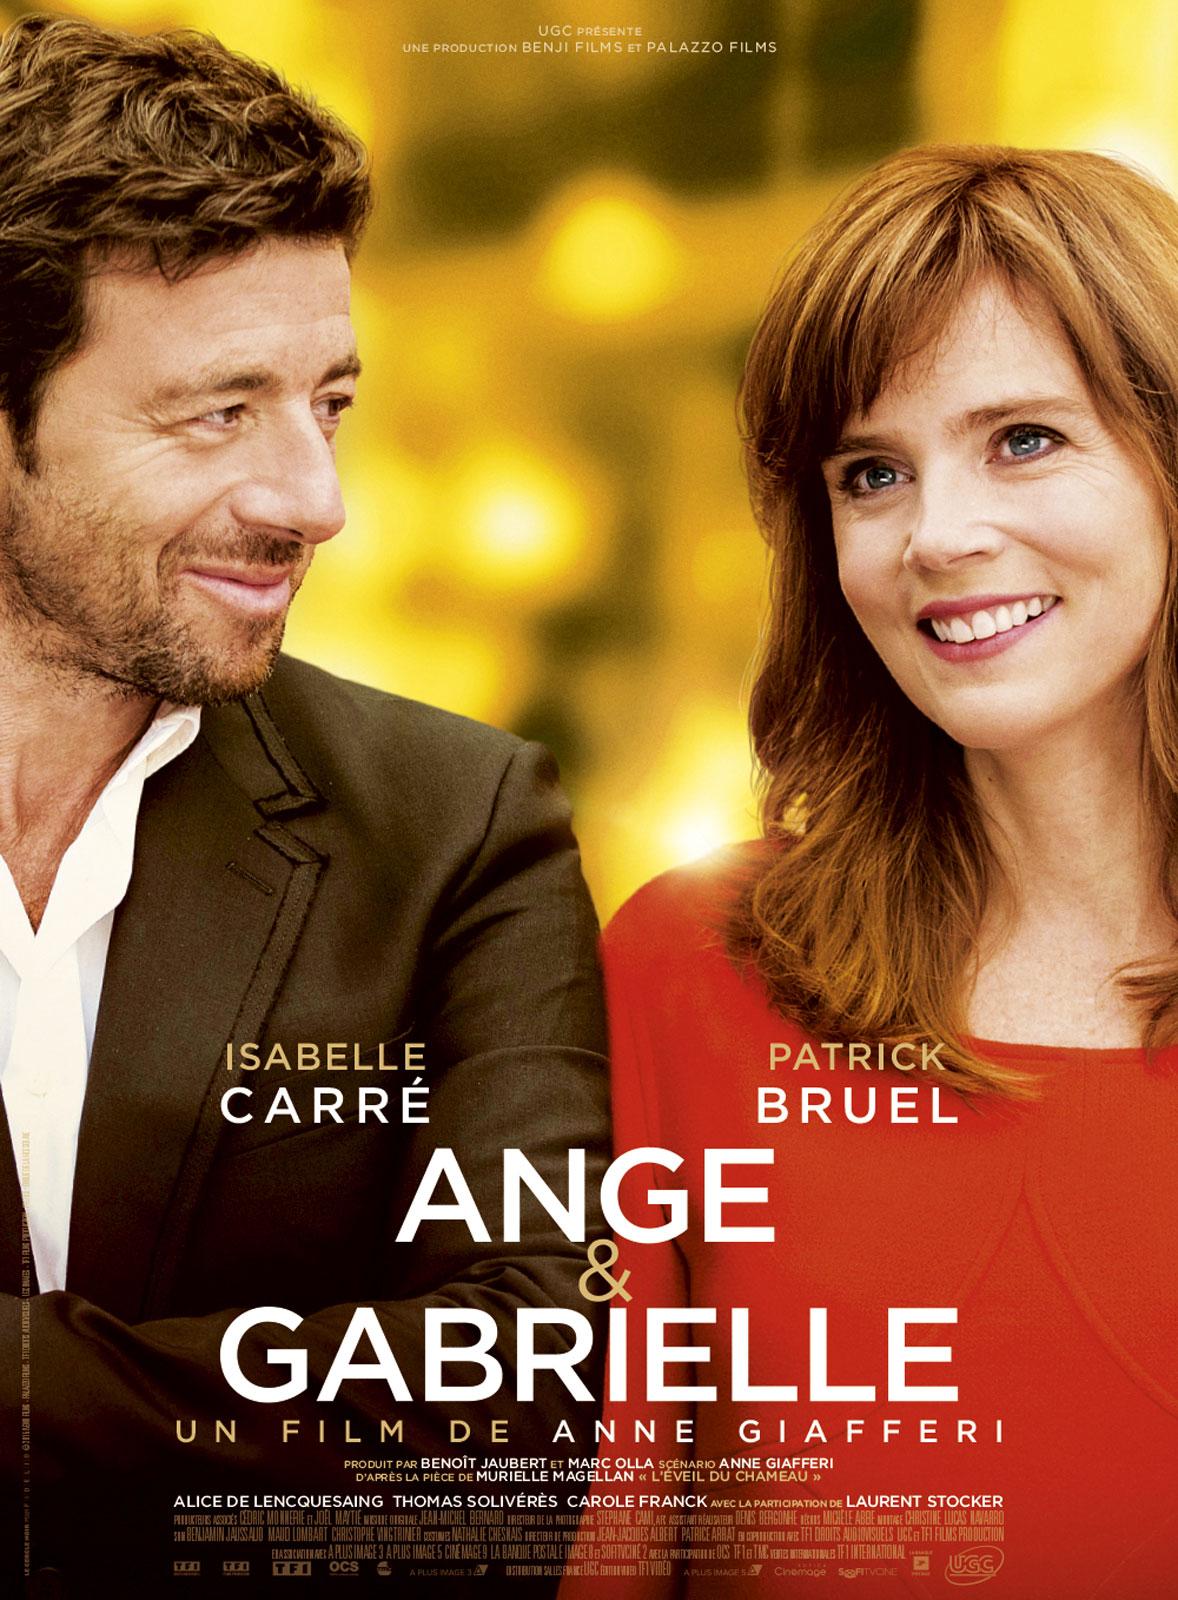 Ange & Gabrielle Film a voir aussi en streaming